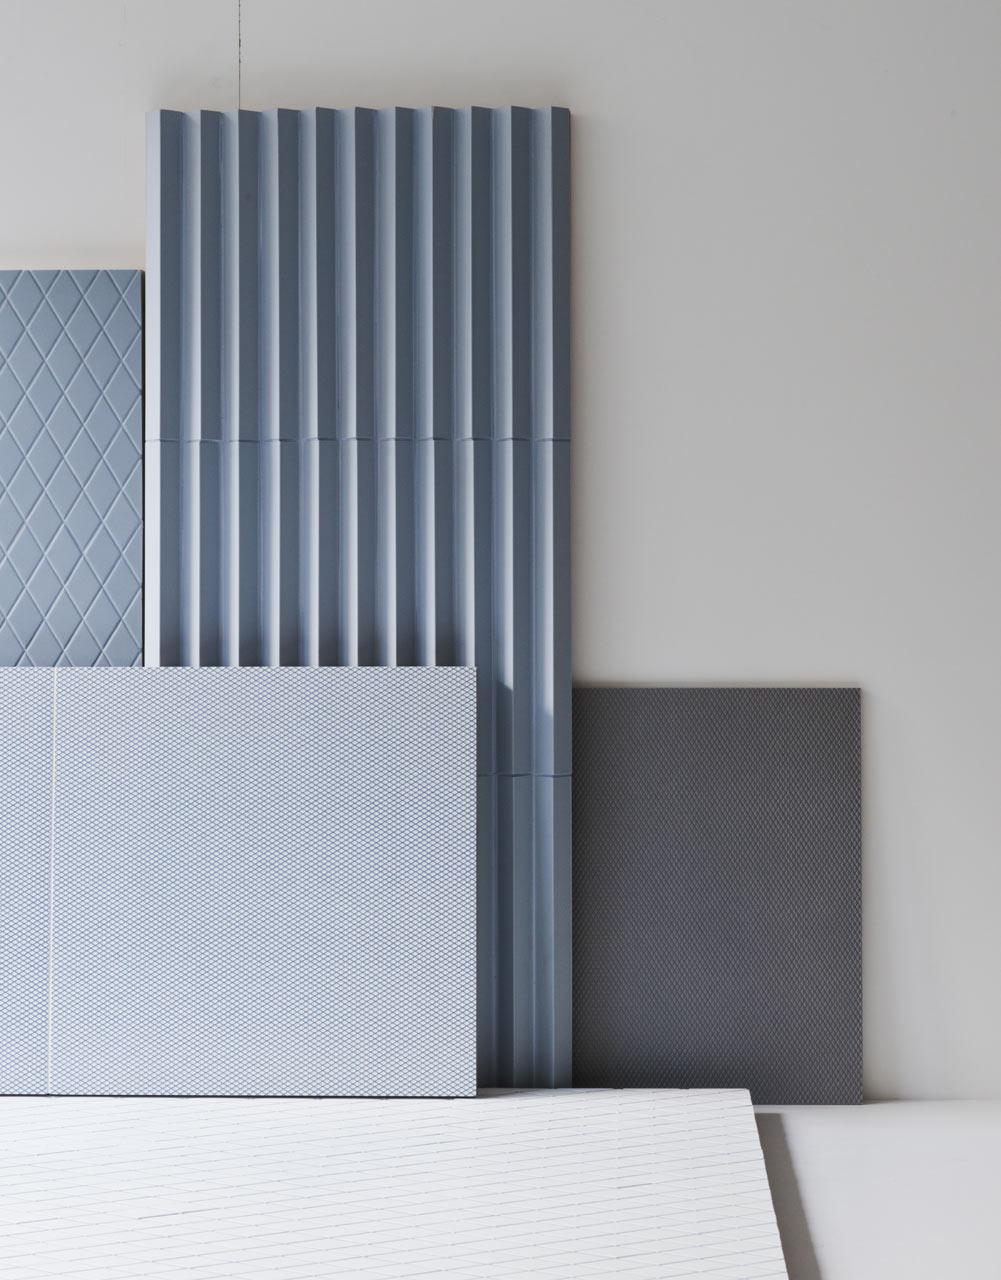 tiles by ronan erwan bouroullec for mutina design milk. Black Bedroom Furniture Sets. Home Design Ideas